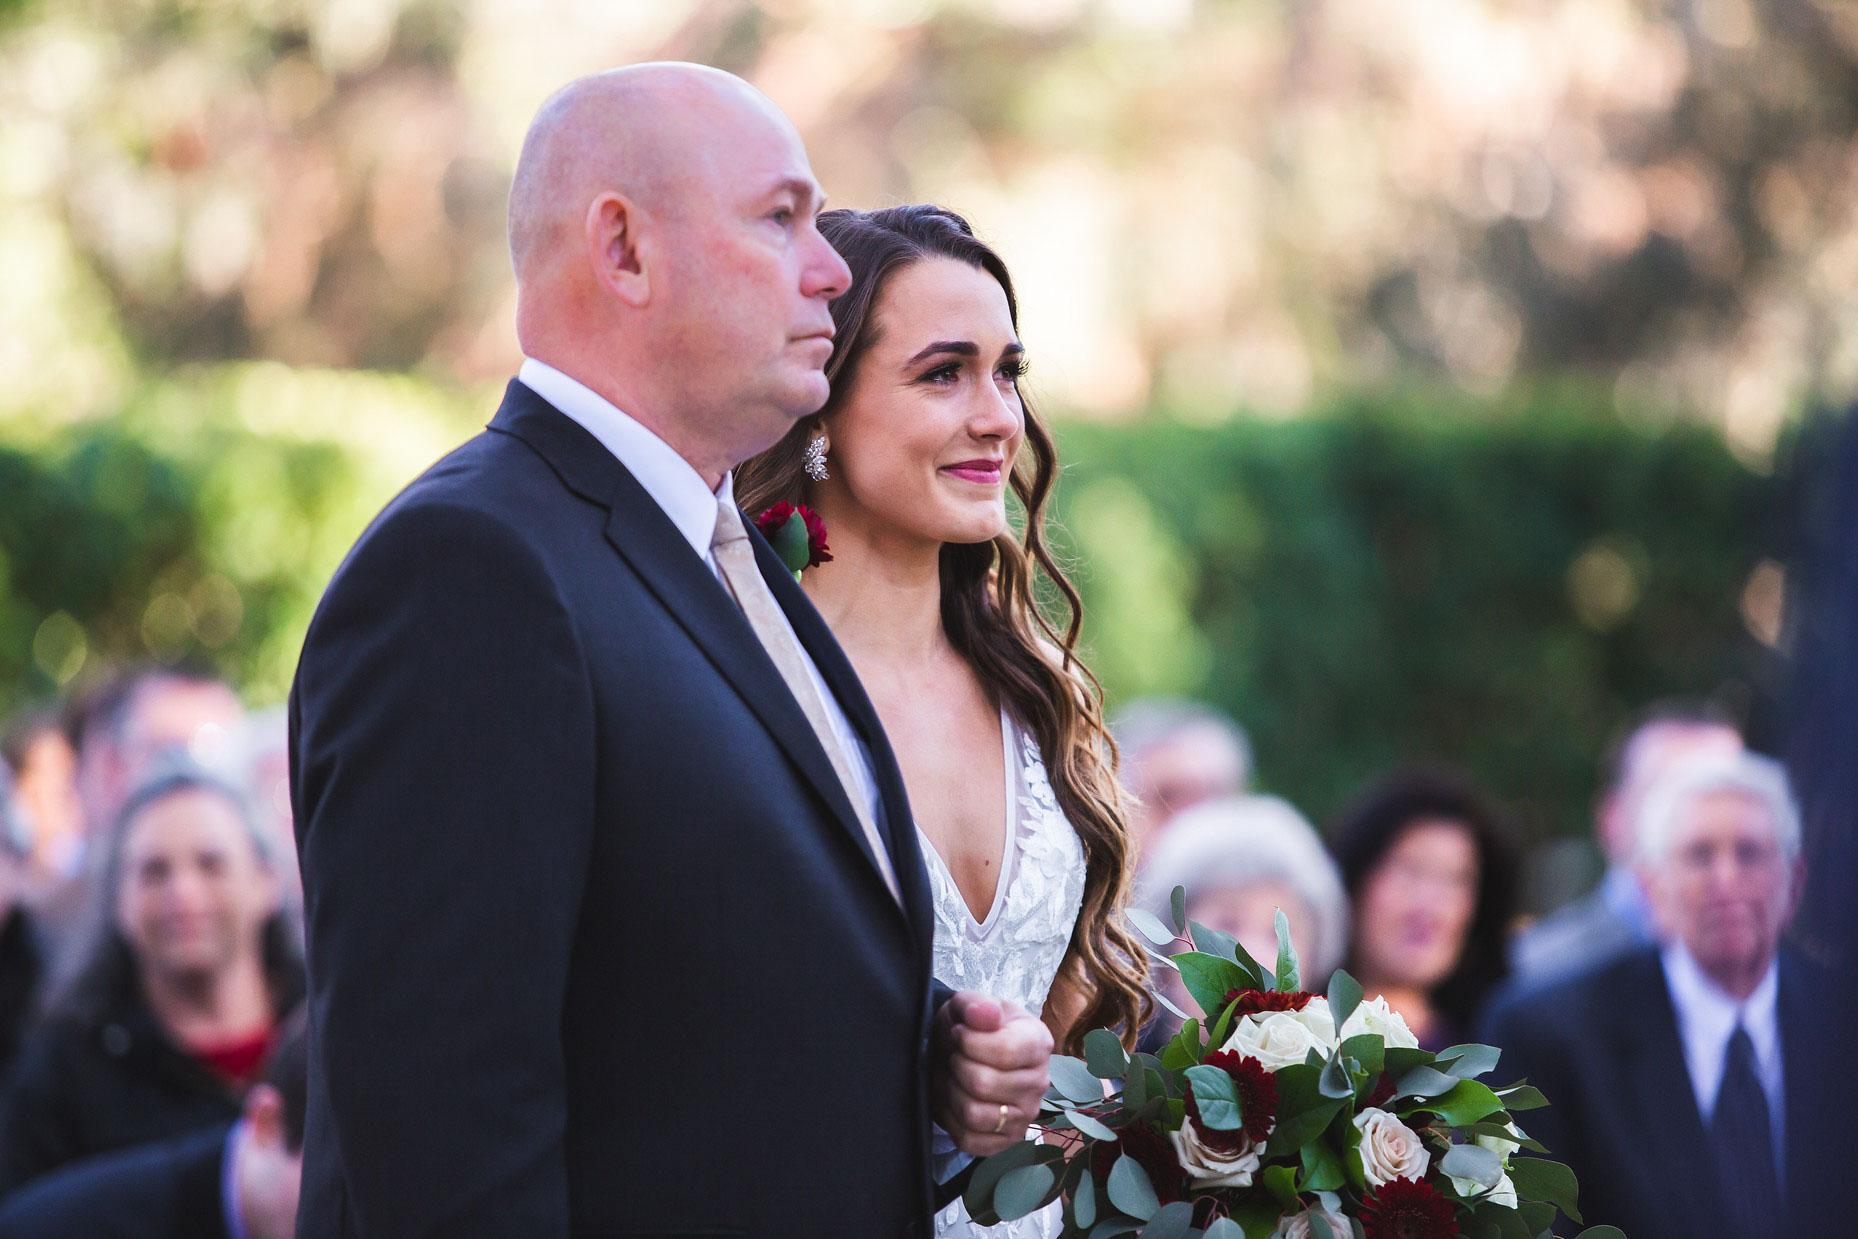 adam-szarmack-bowing-oaks-wedding-photographer-jacksonville-74.jpg